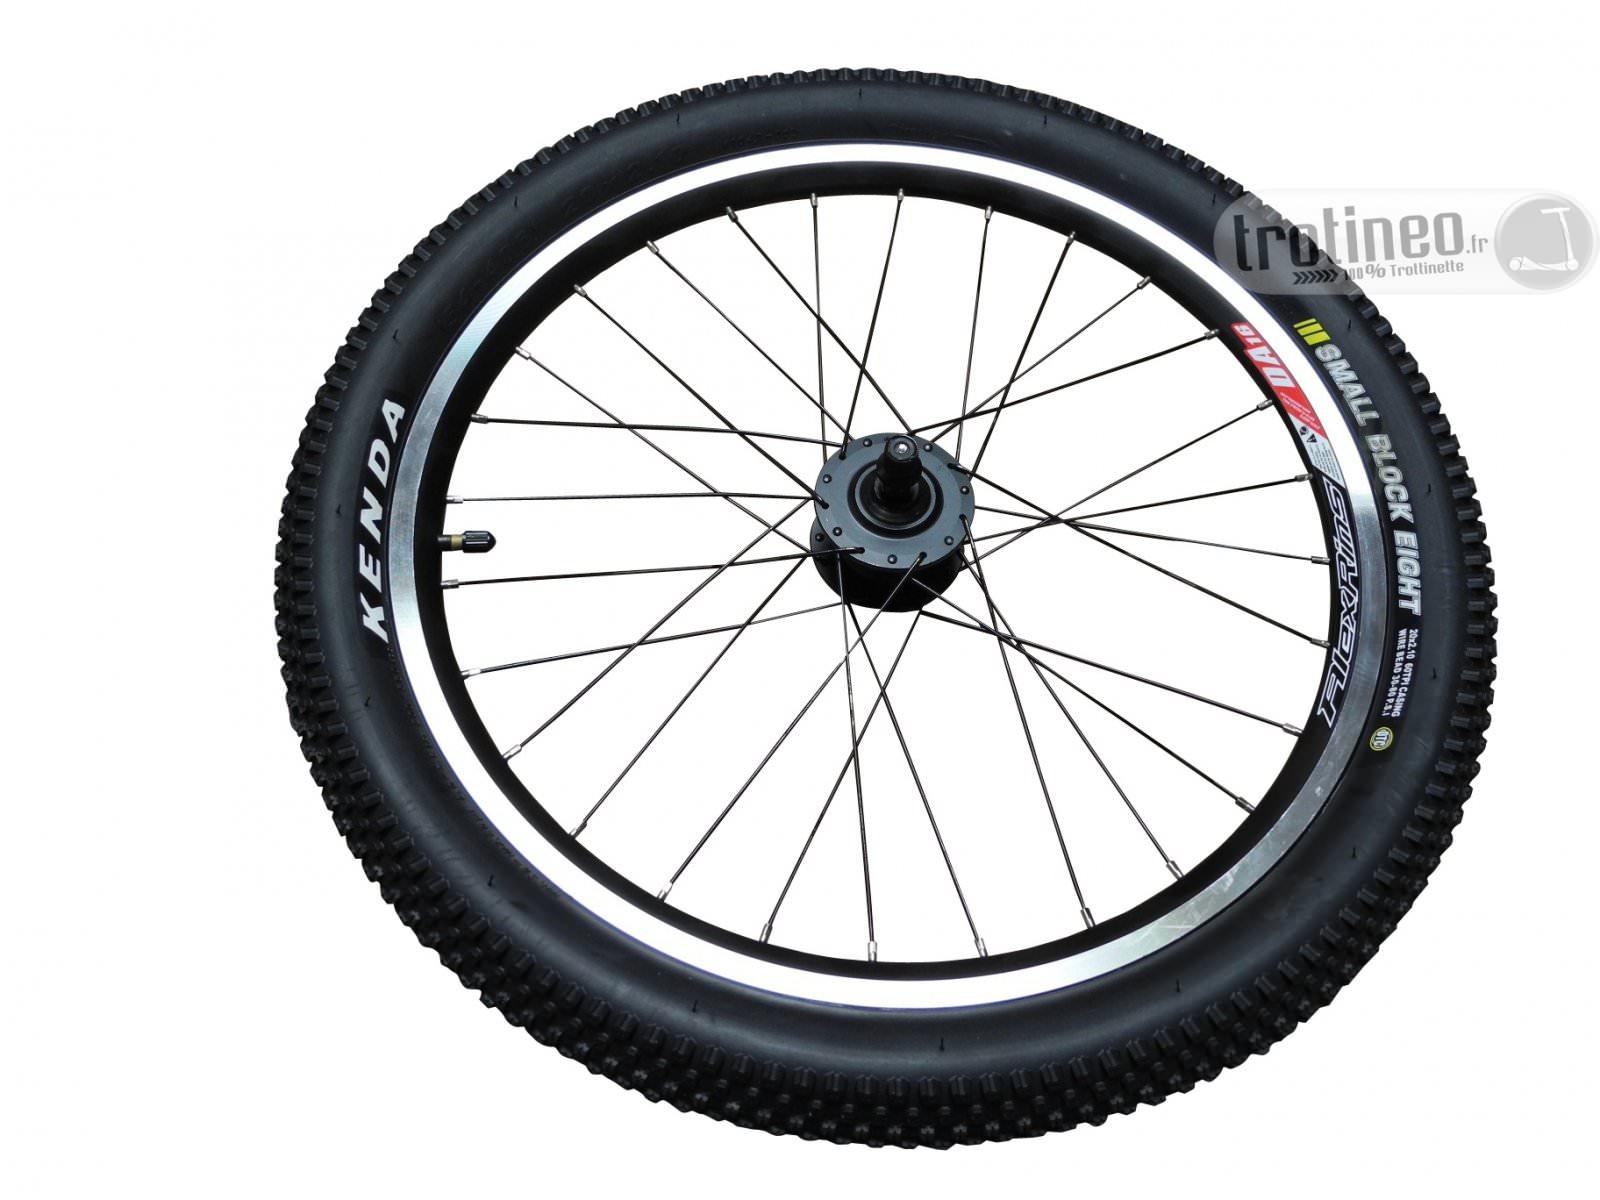 kickbike-roue complète Ar Xmax 20